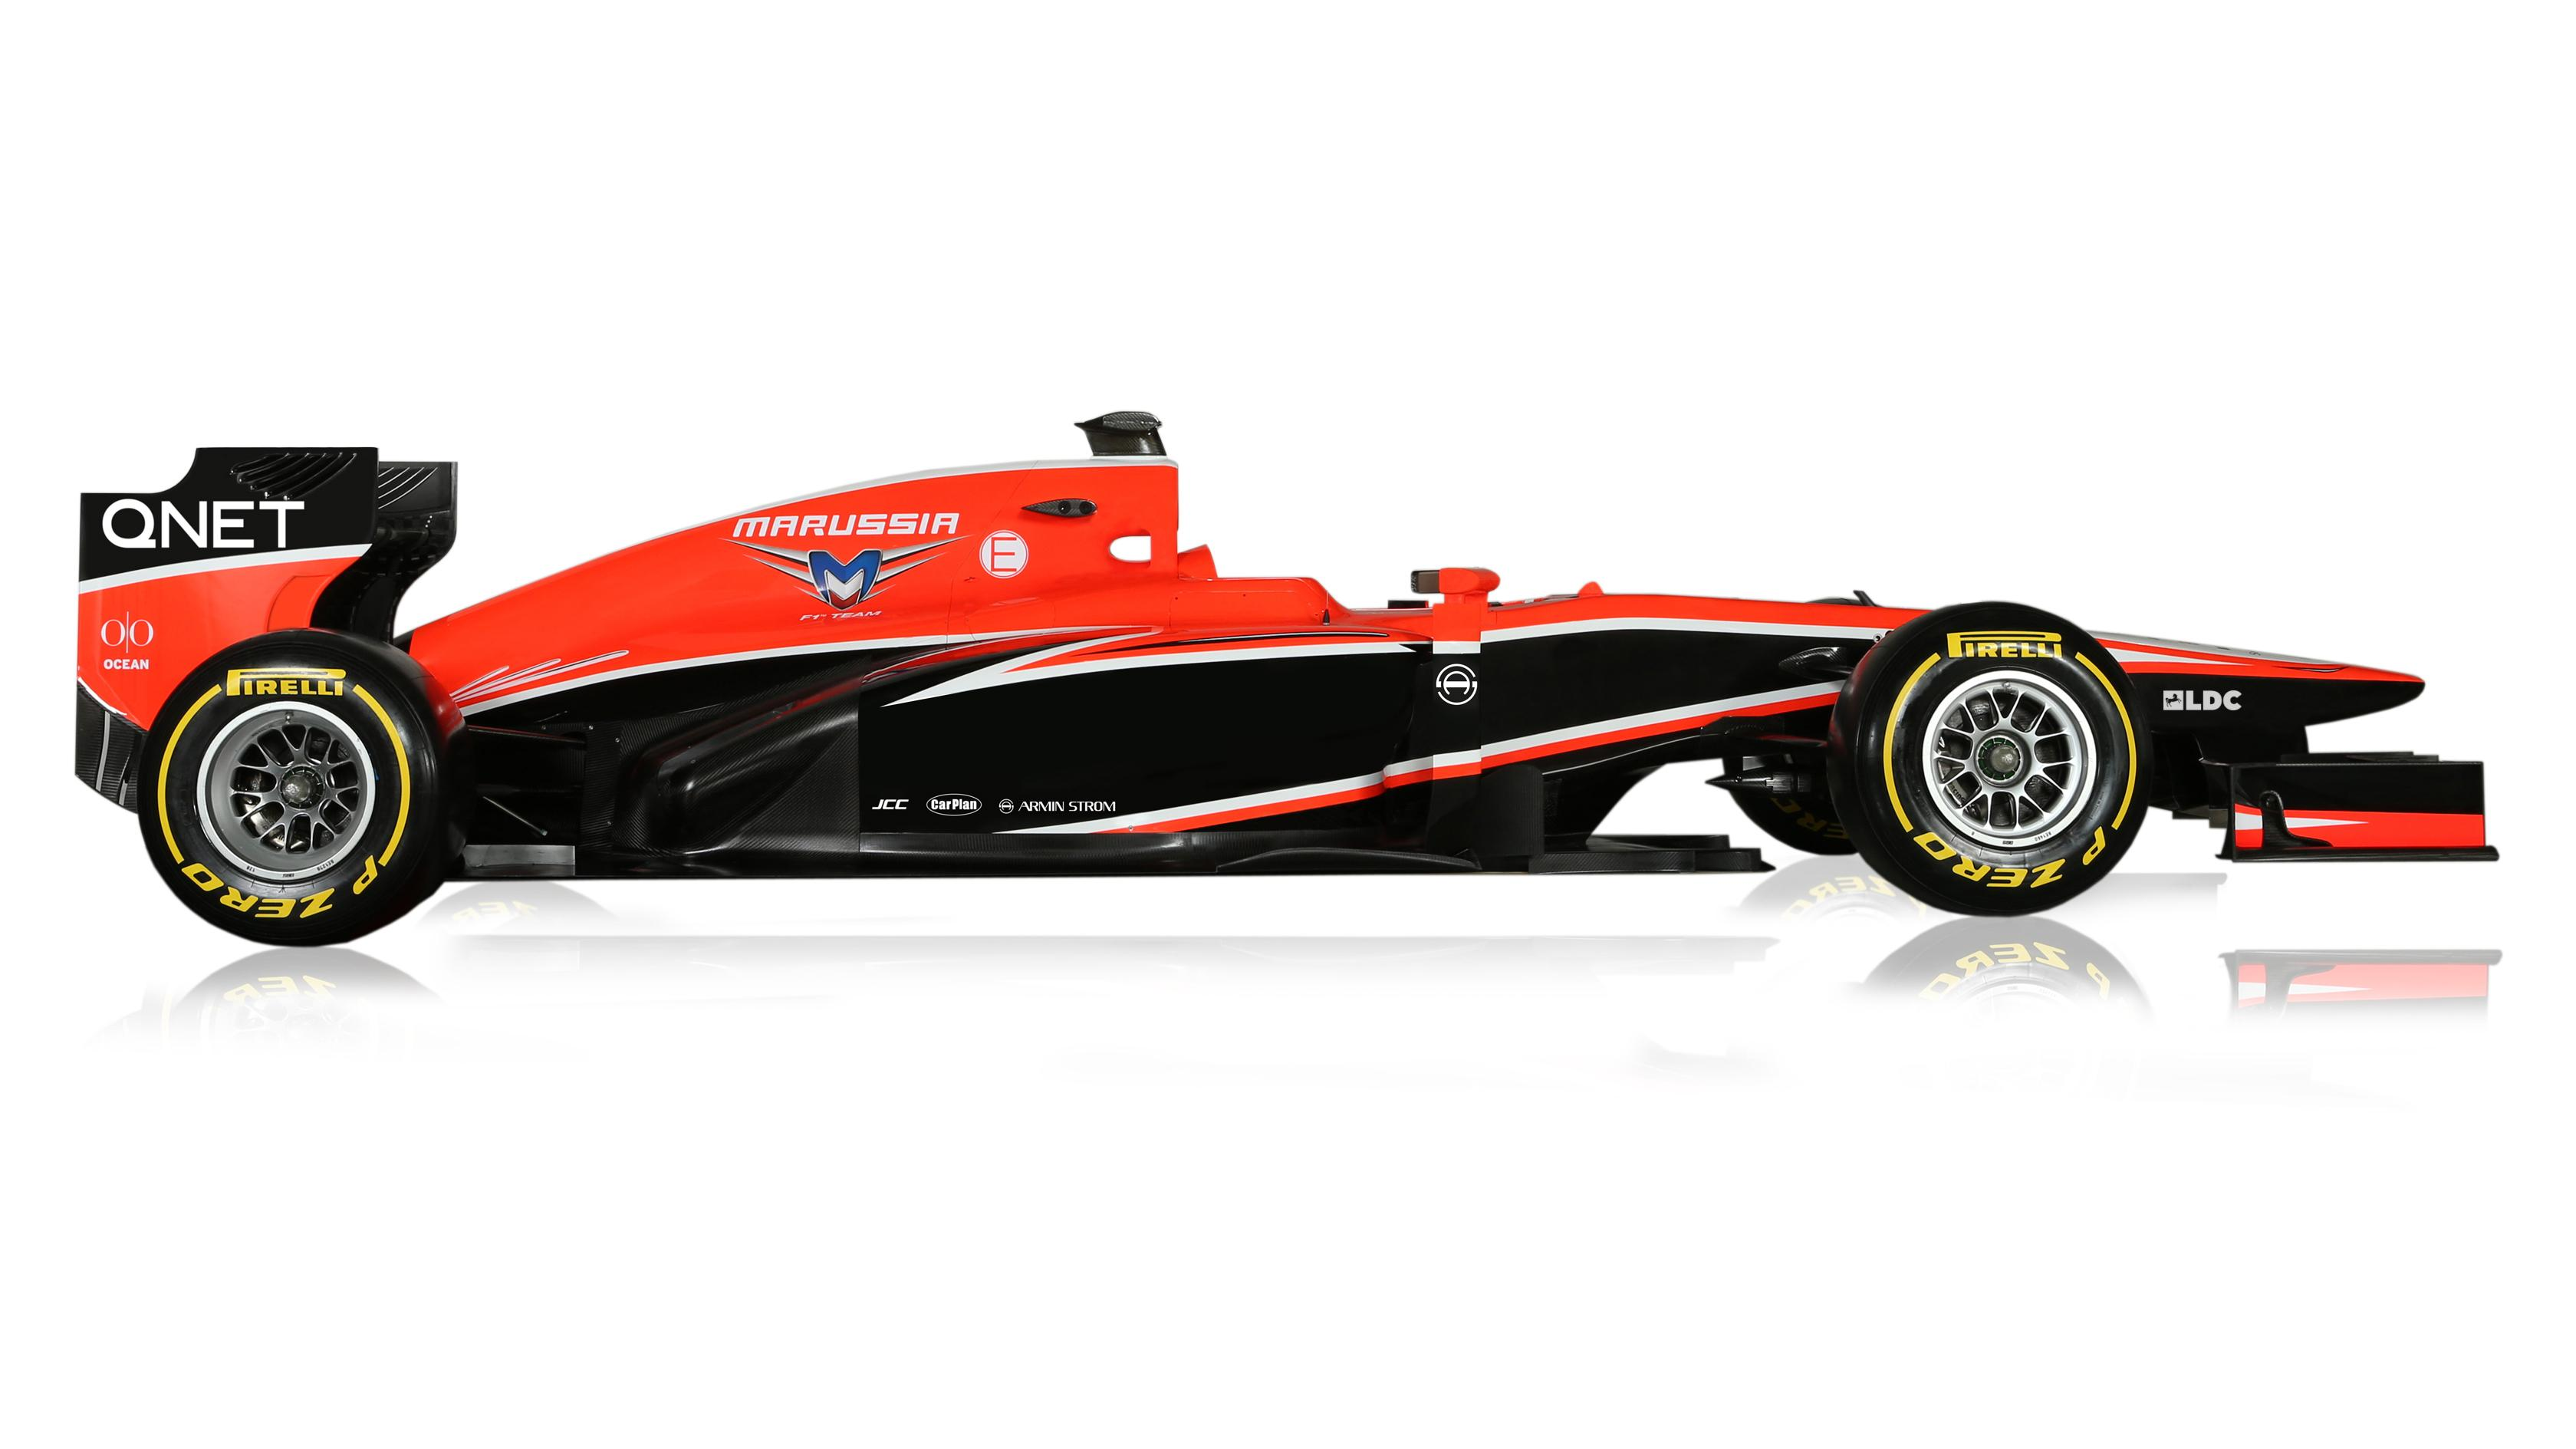 A Marussia de 2013